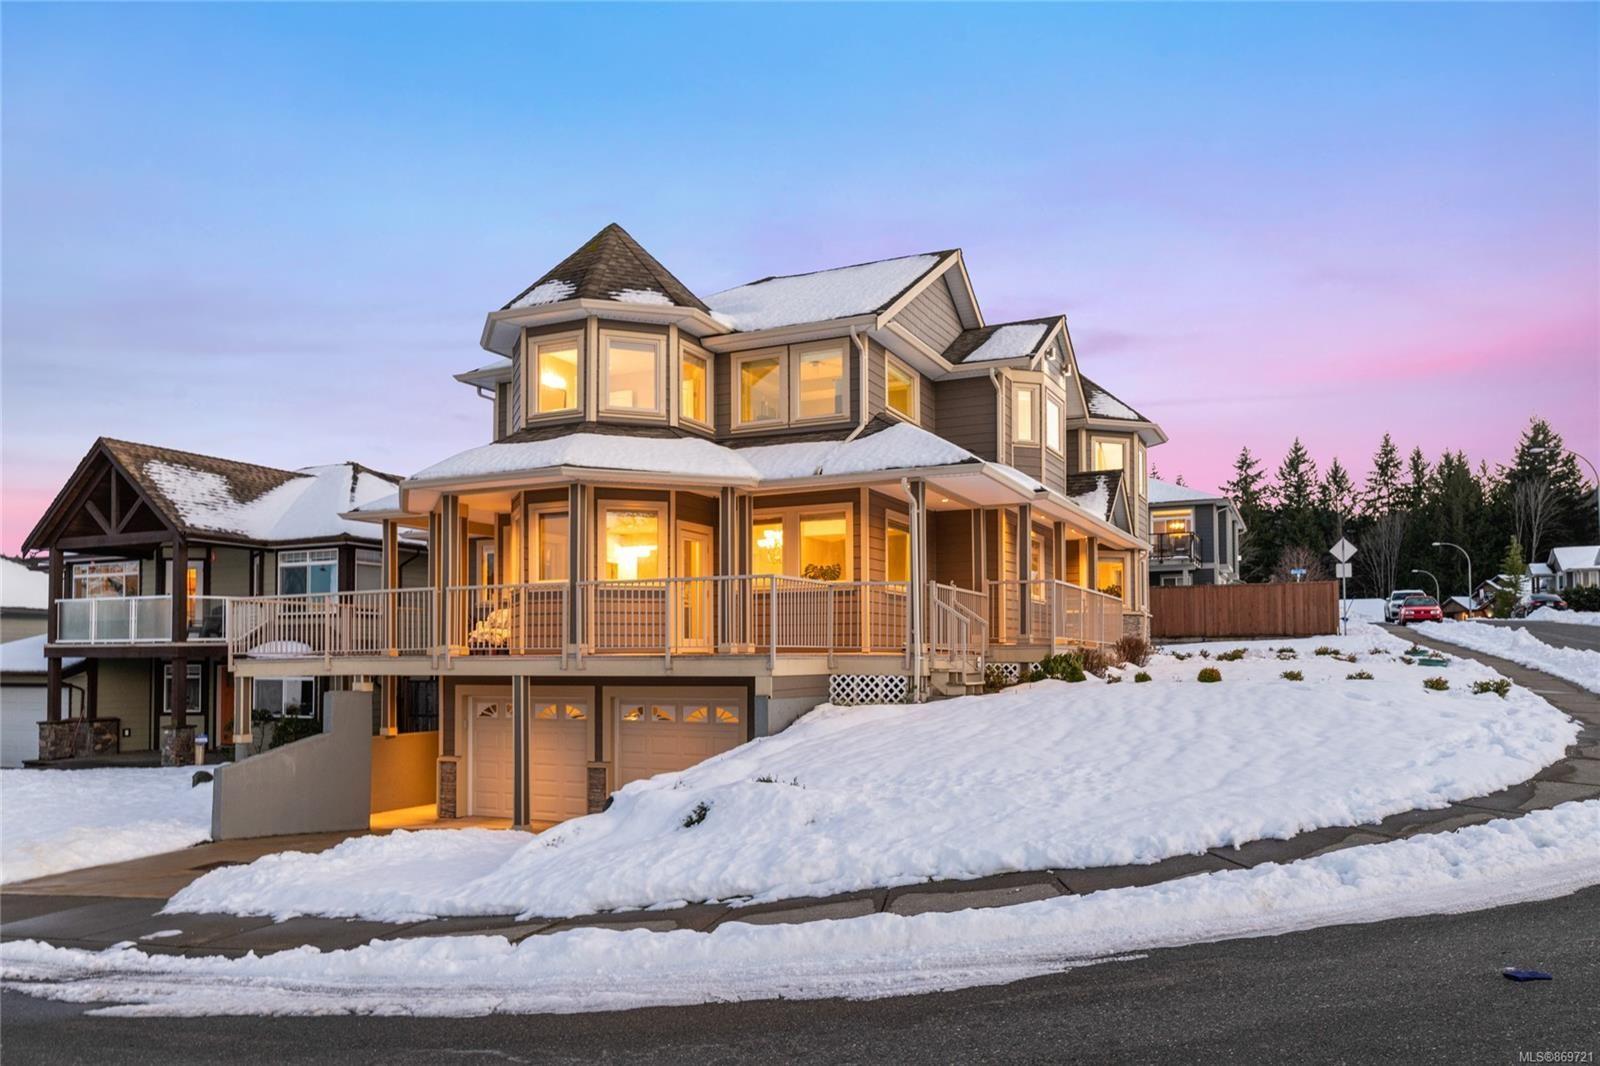 Photo 35: Photos: 2259 Leighton Rd in : Na South Jingle Pot House for sale (Nanaimo)  : MLS®# 869721